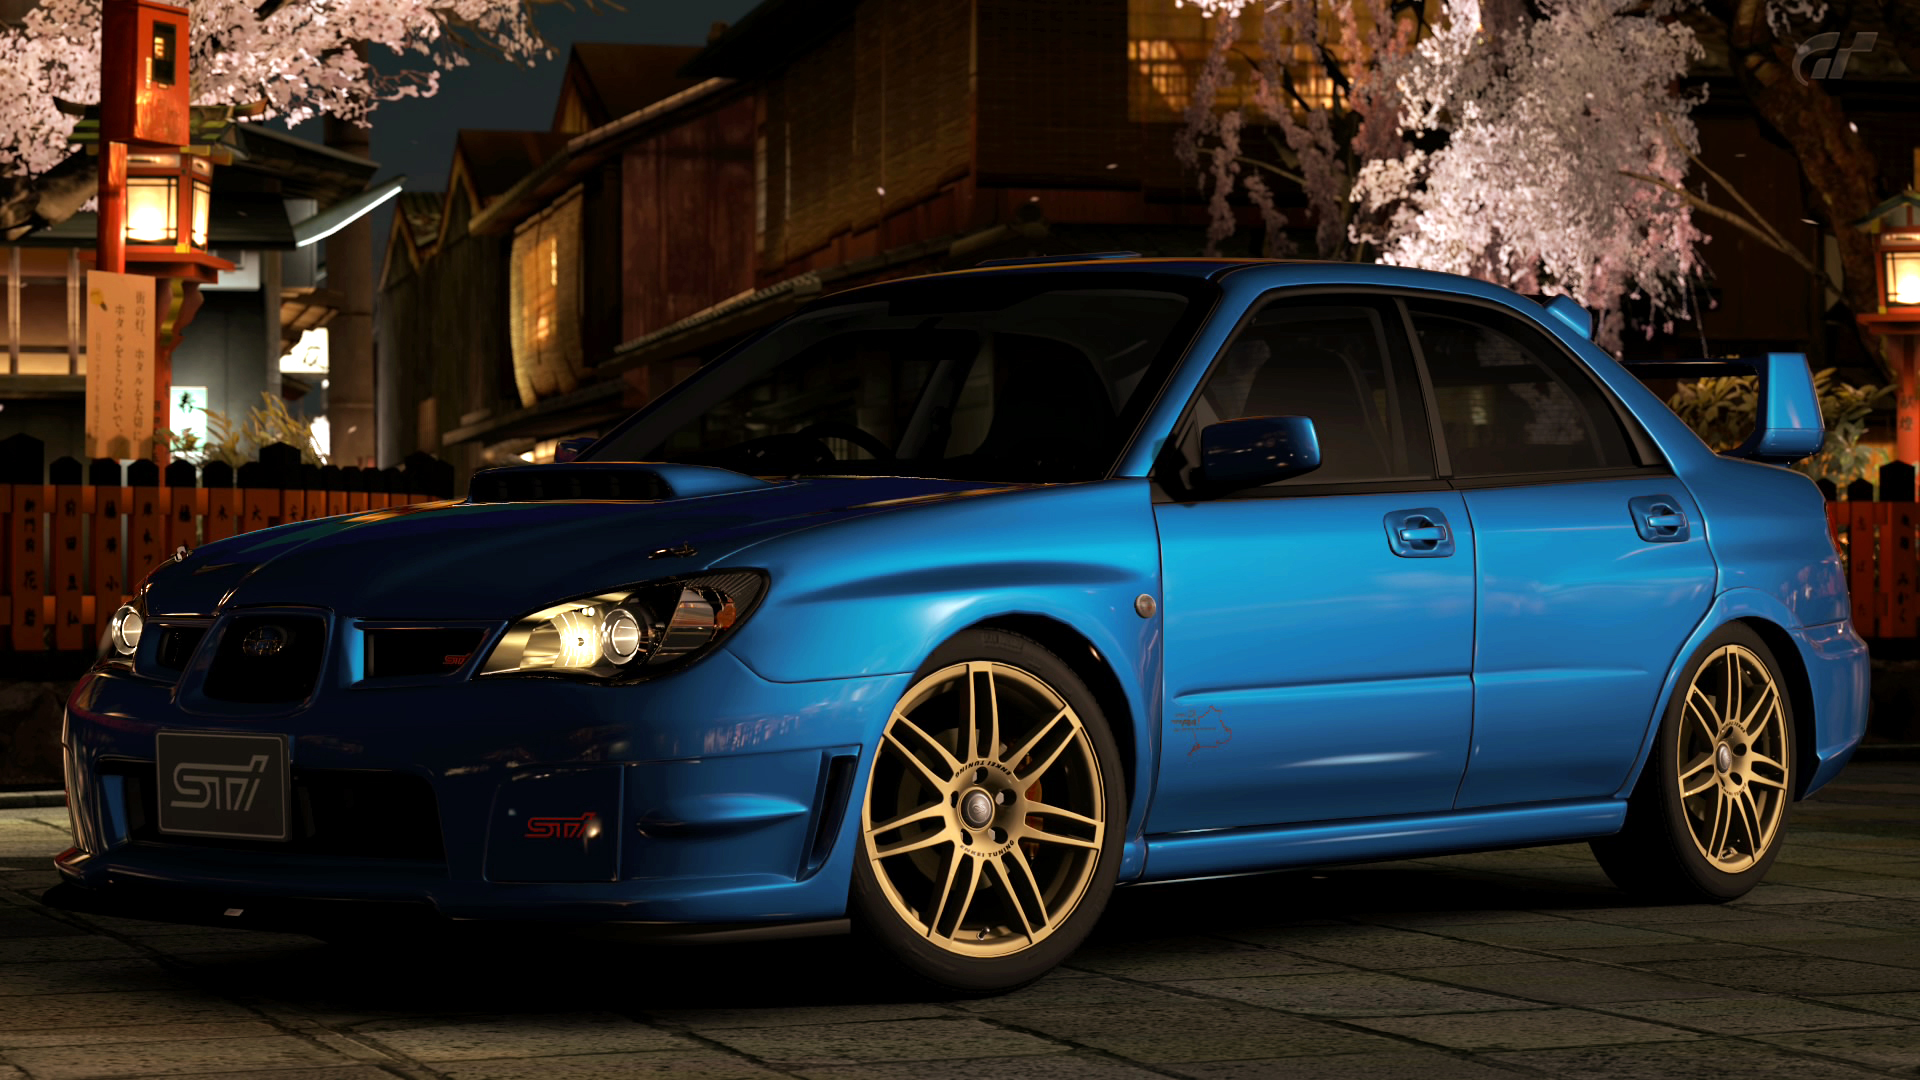 2005 Subaru Impreza WRX STI spec C Type RA 2005 related infomation